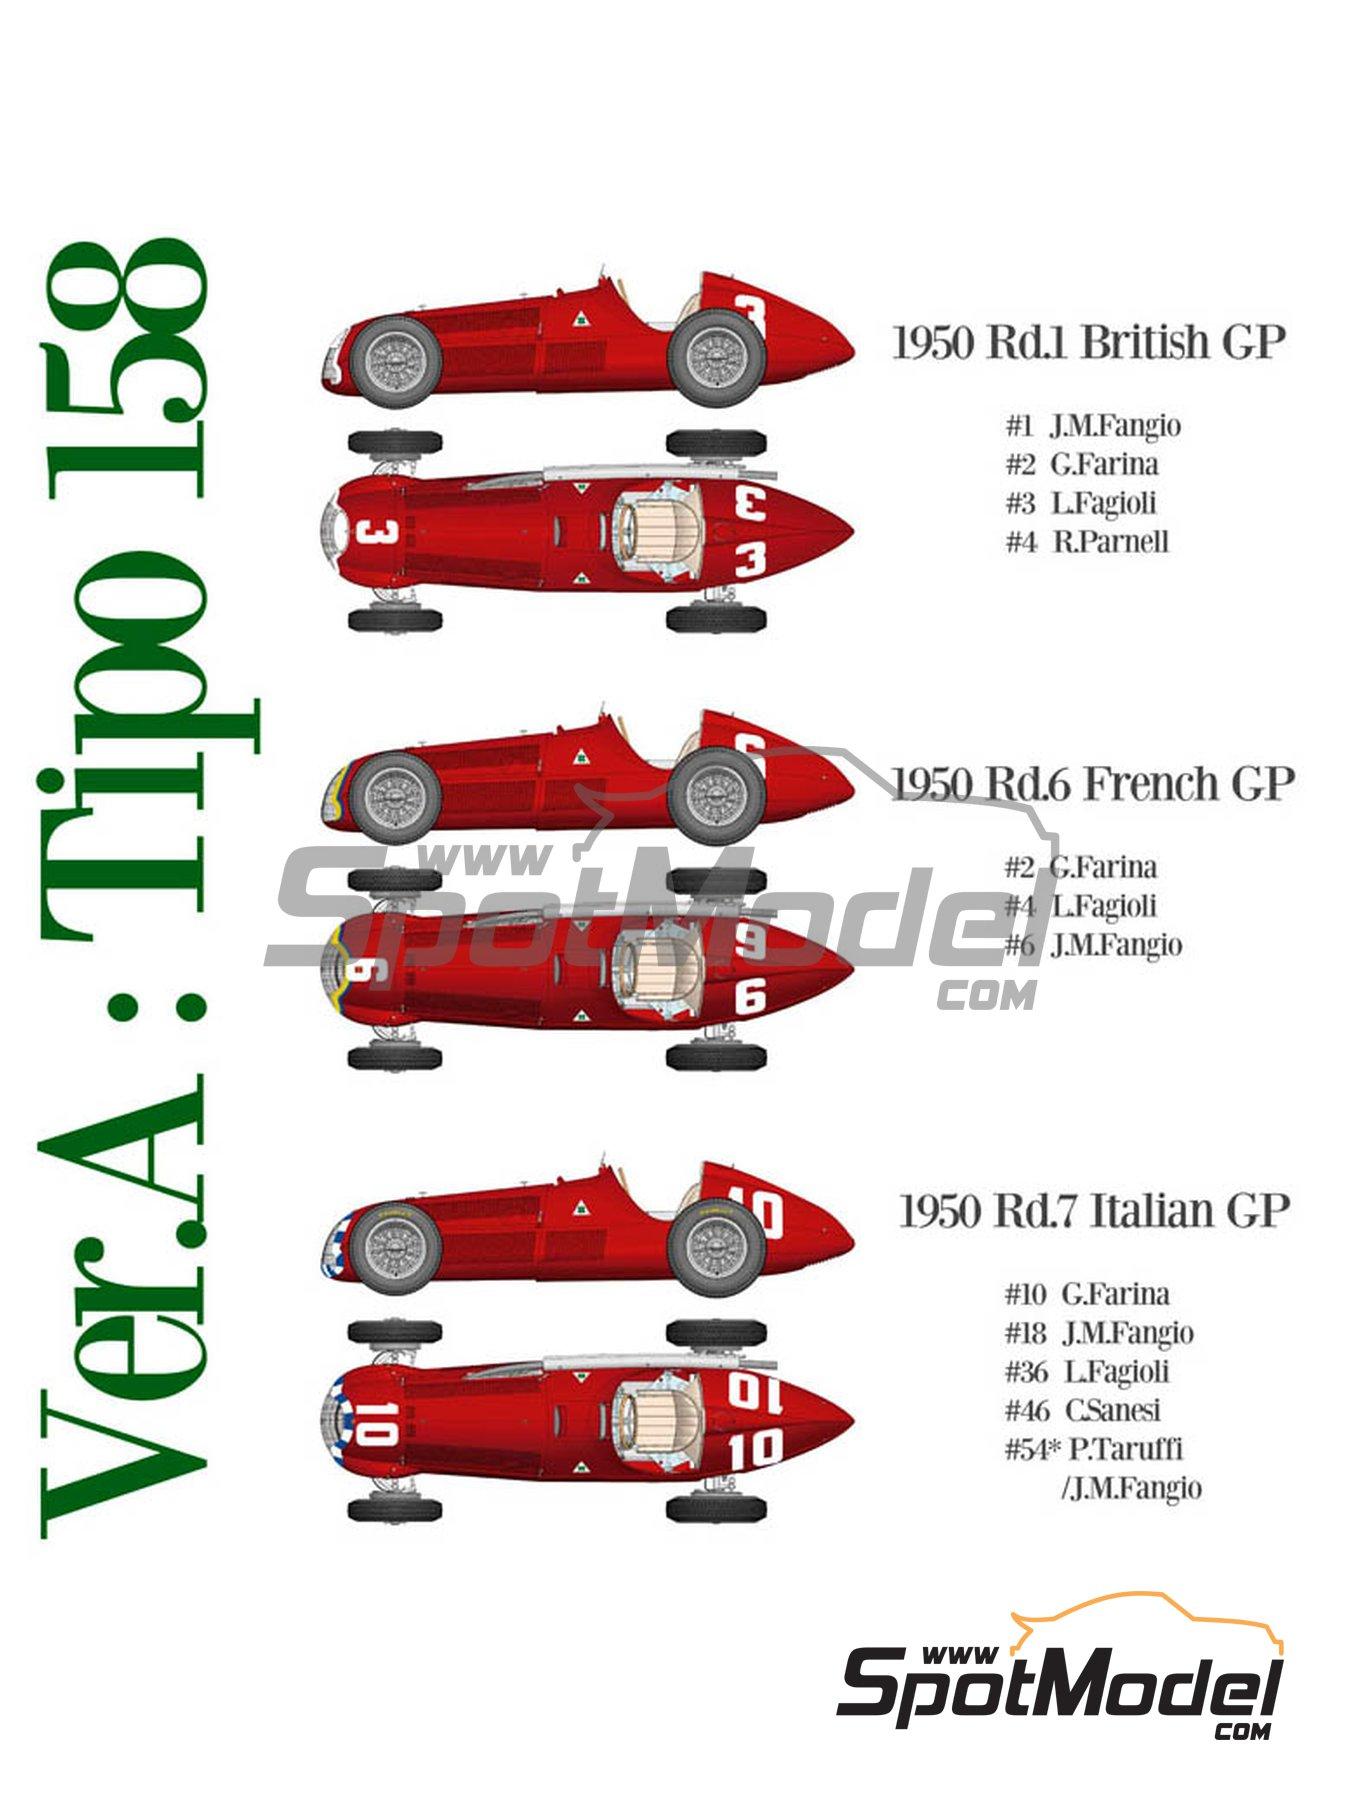 Alfa Romeo 158 Alfetta - French Formula 1 Grand Prix, British Formula 1 Grand Prix, Italian Formula 1 Grand Prix 1950 | Model car kit in 1/12 scale manufactured by Model Factory Hiro (ref.MFH-K519, also K-519) image